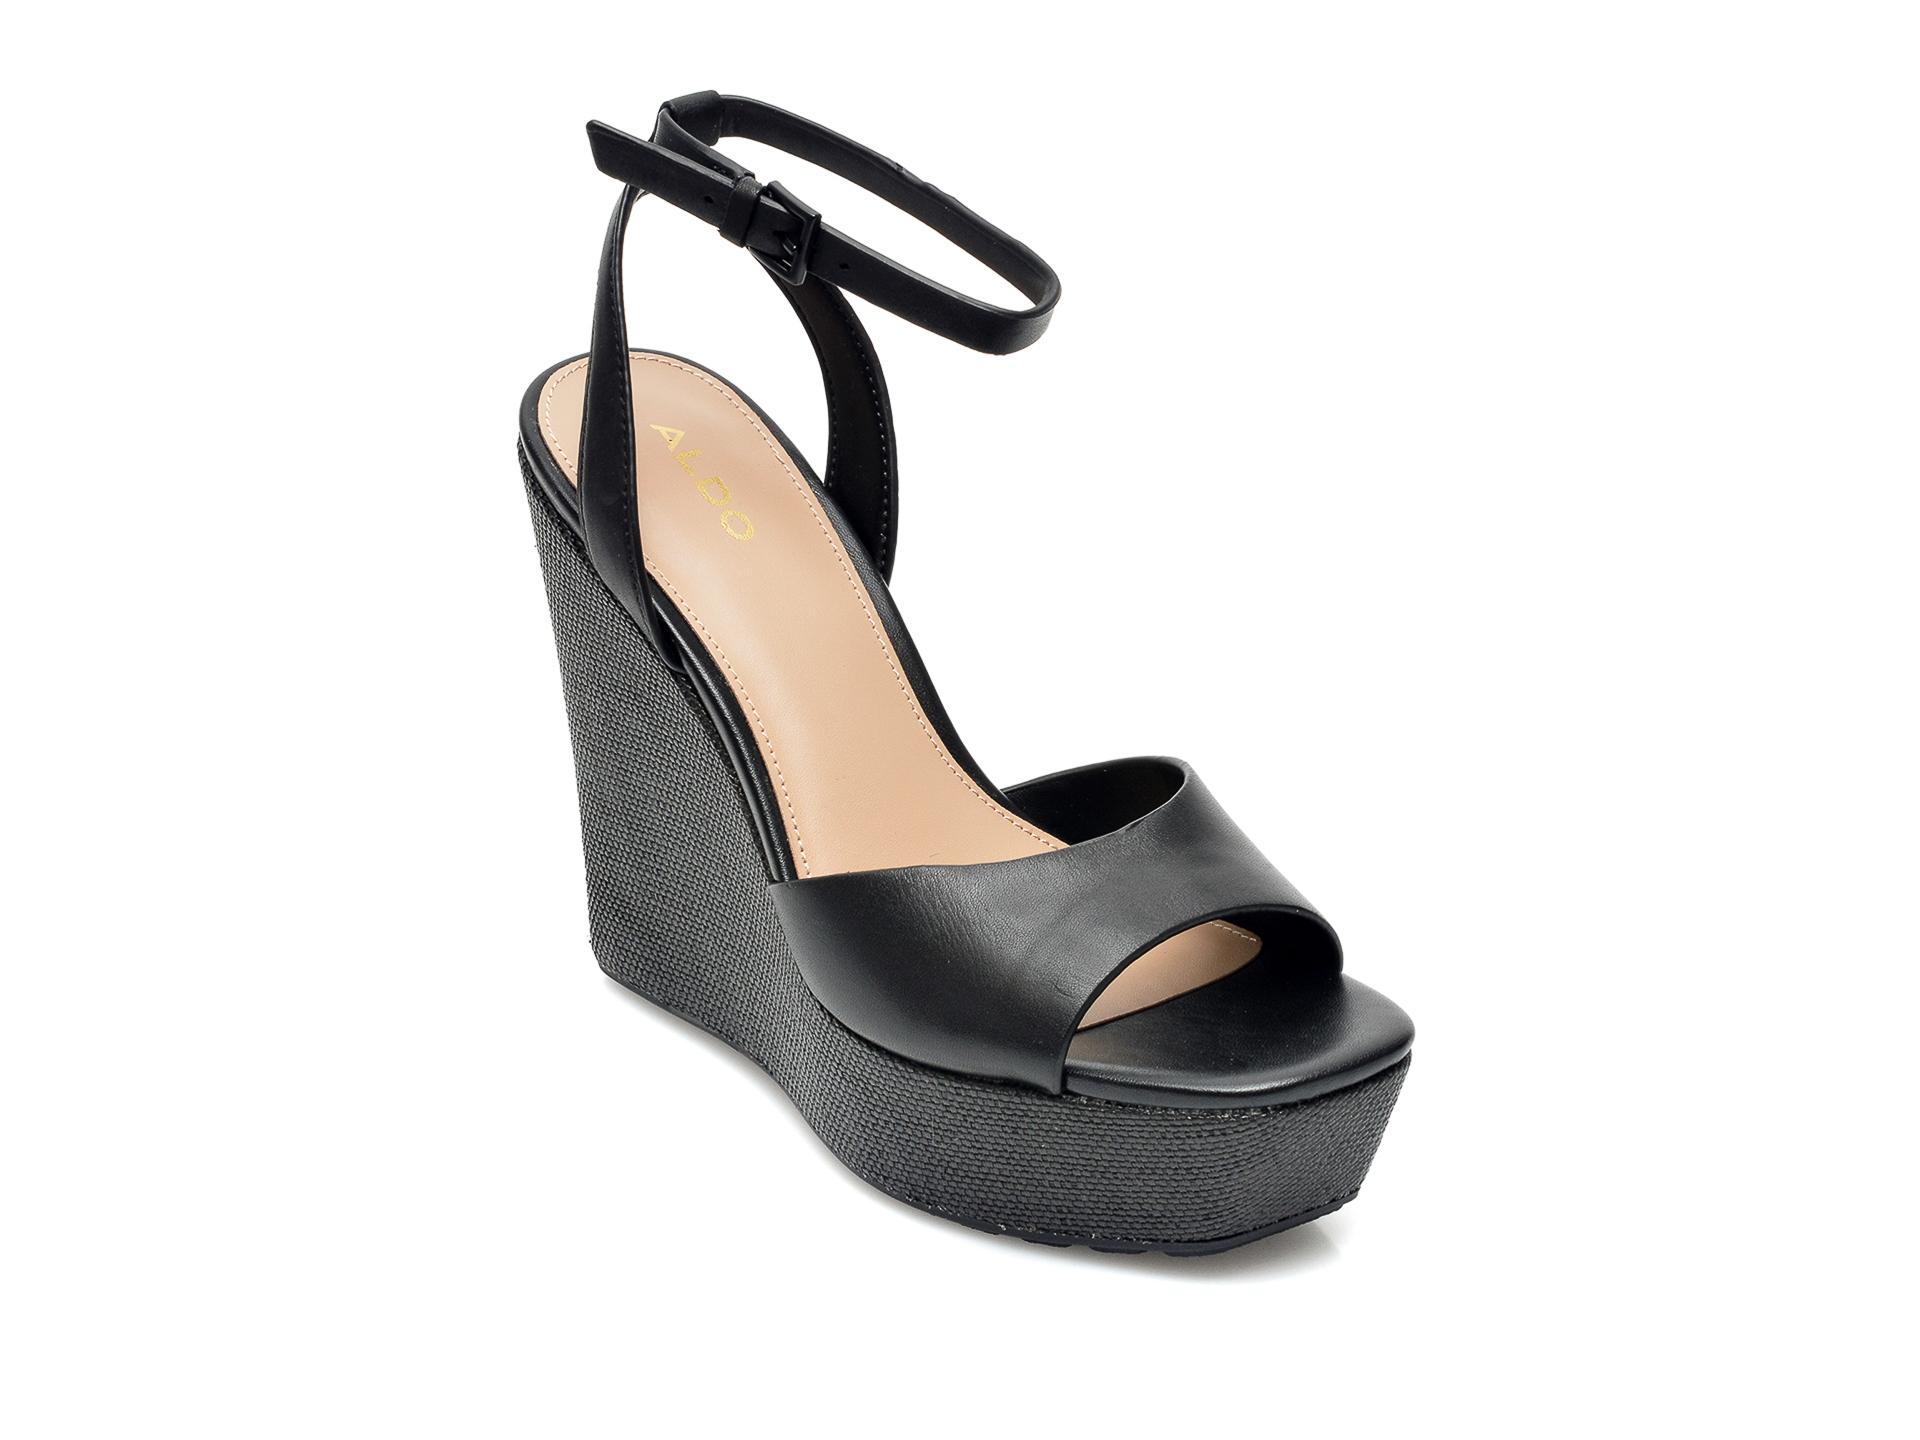 Sandale ALDO negre, Verly001, din piele ecologica imagine otter.ro 2021